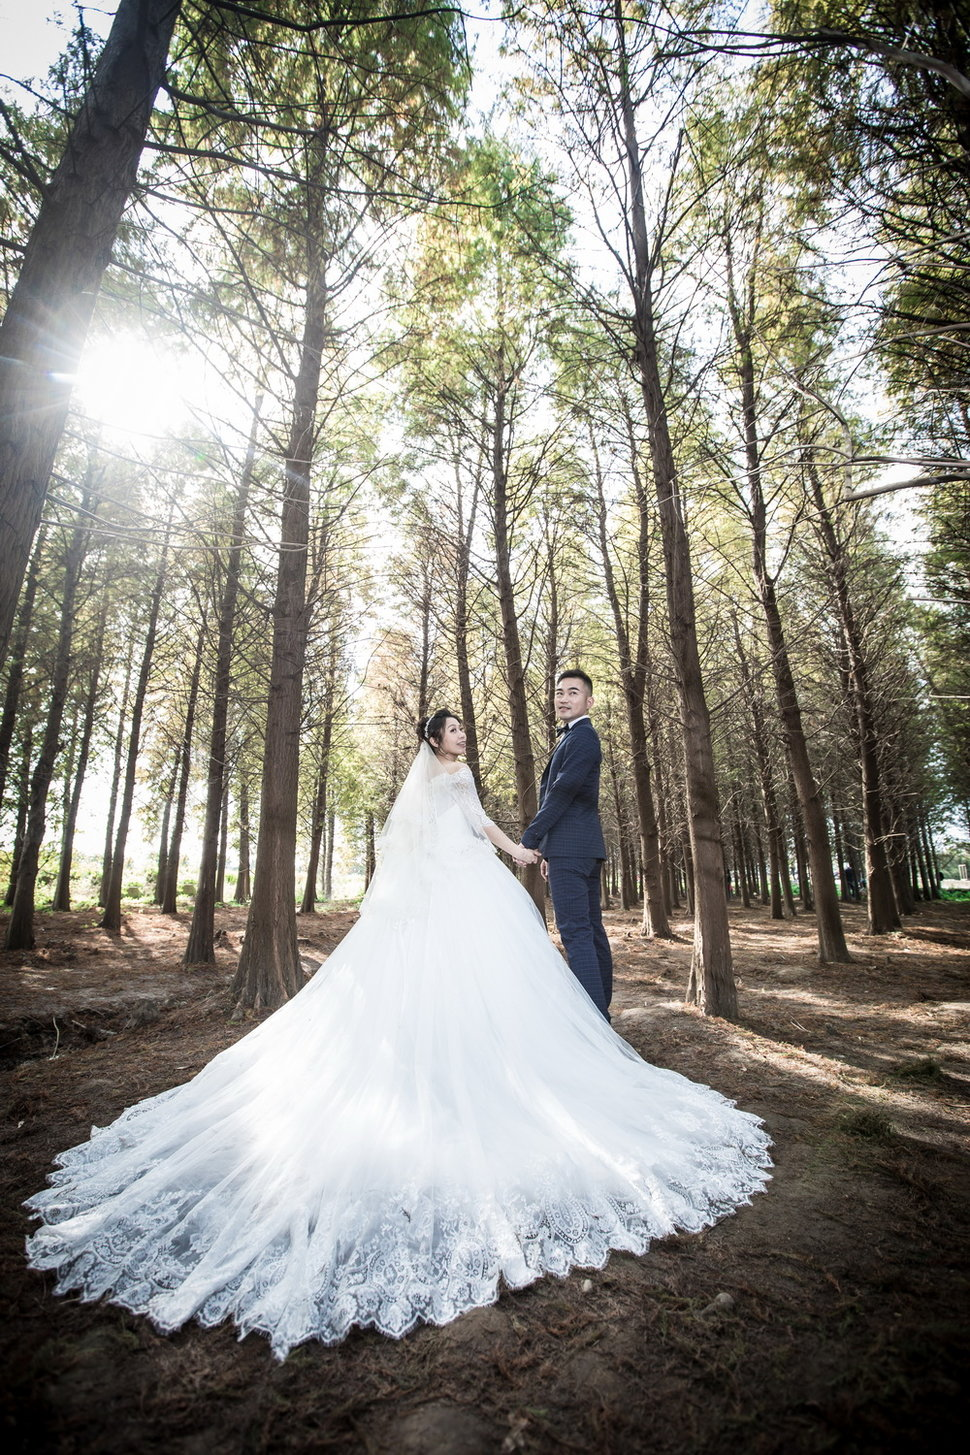 IMG_8785 - 春之嫁衣精緻婚紗 - 結婚吧